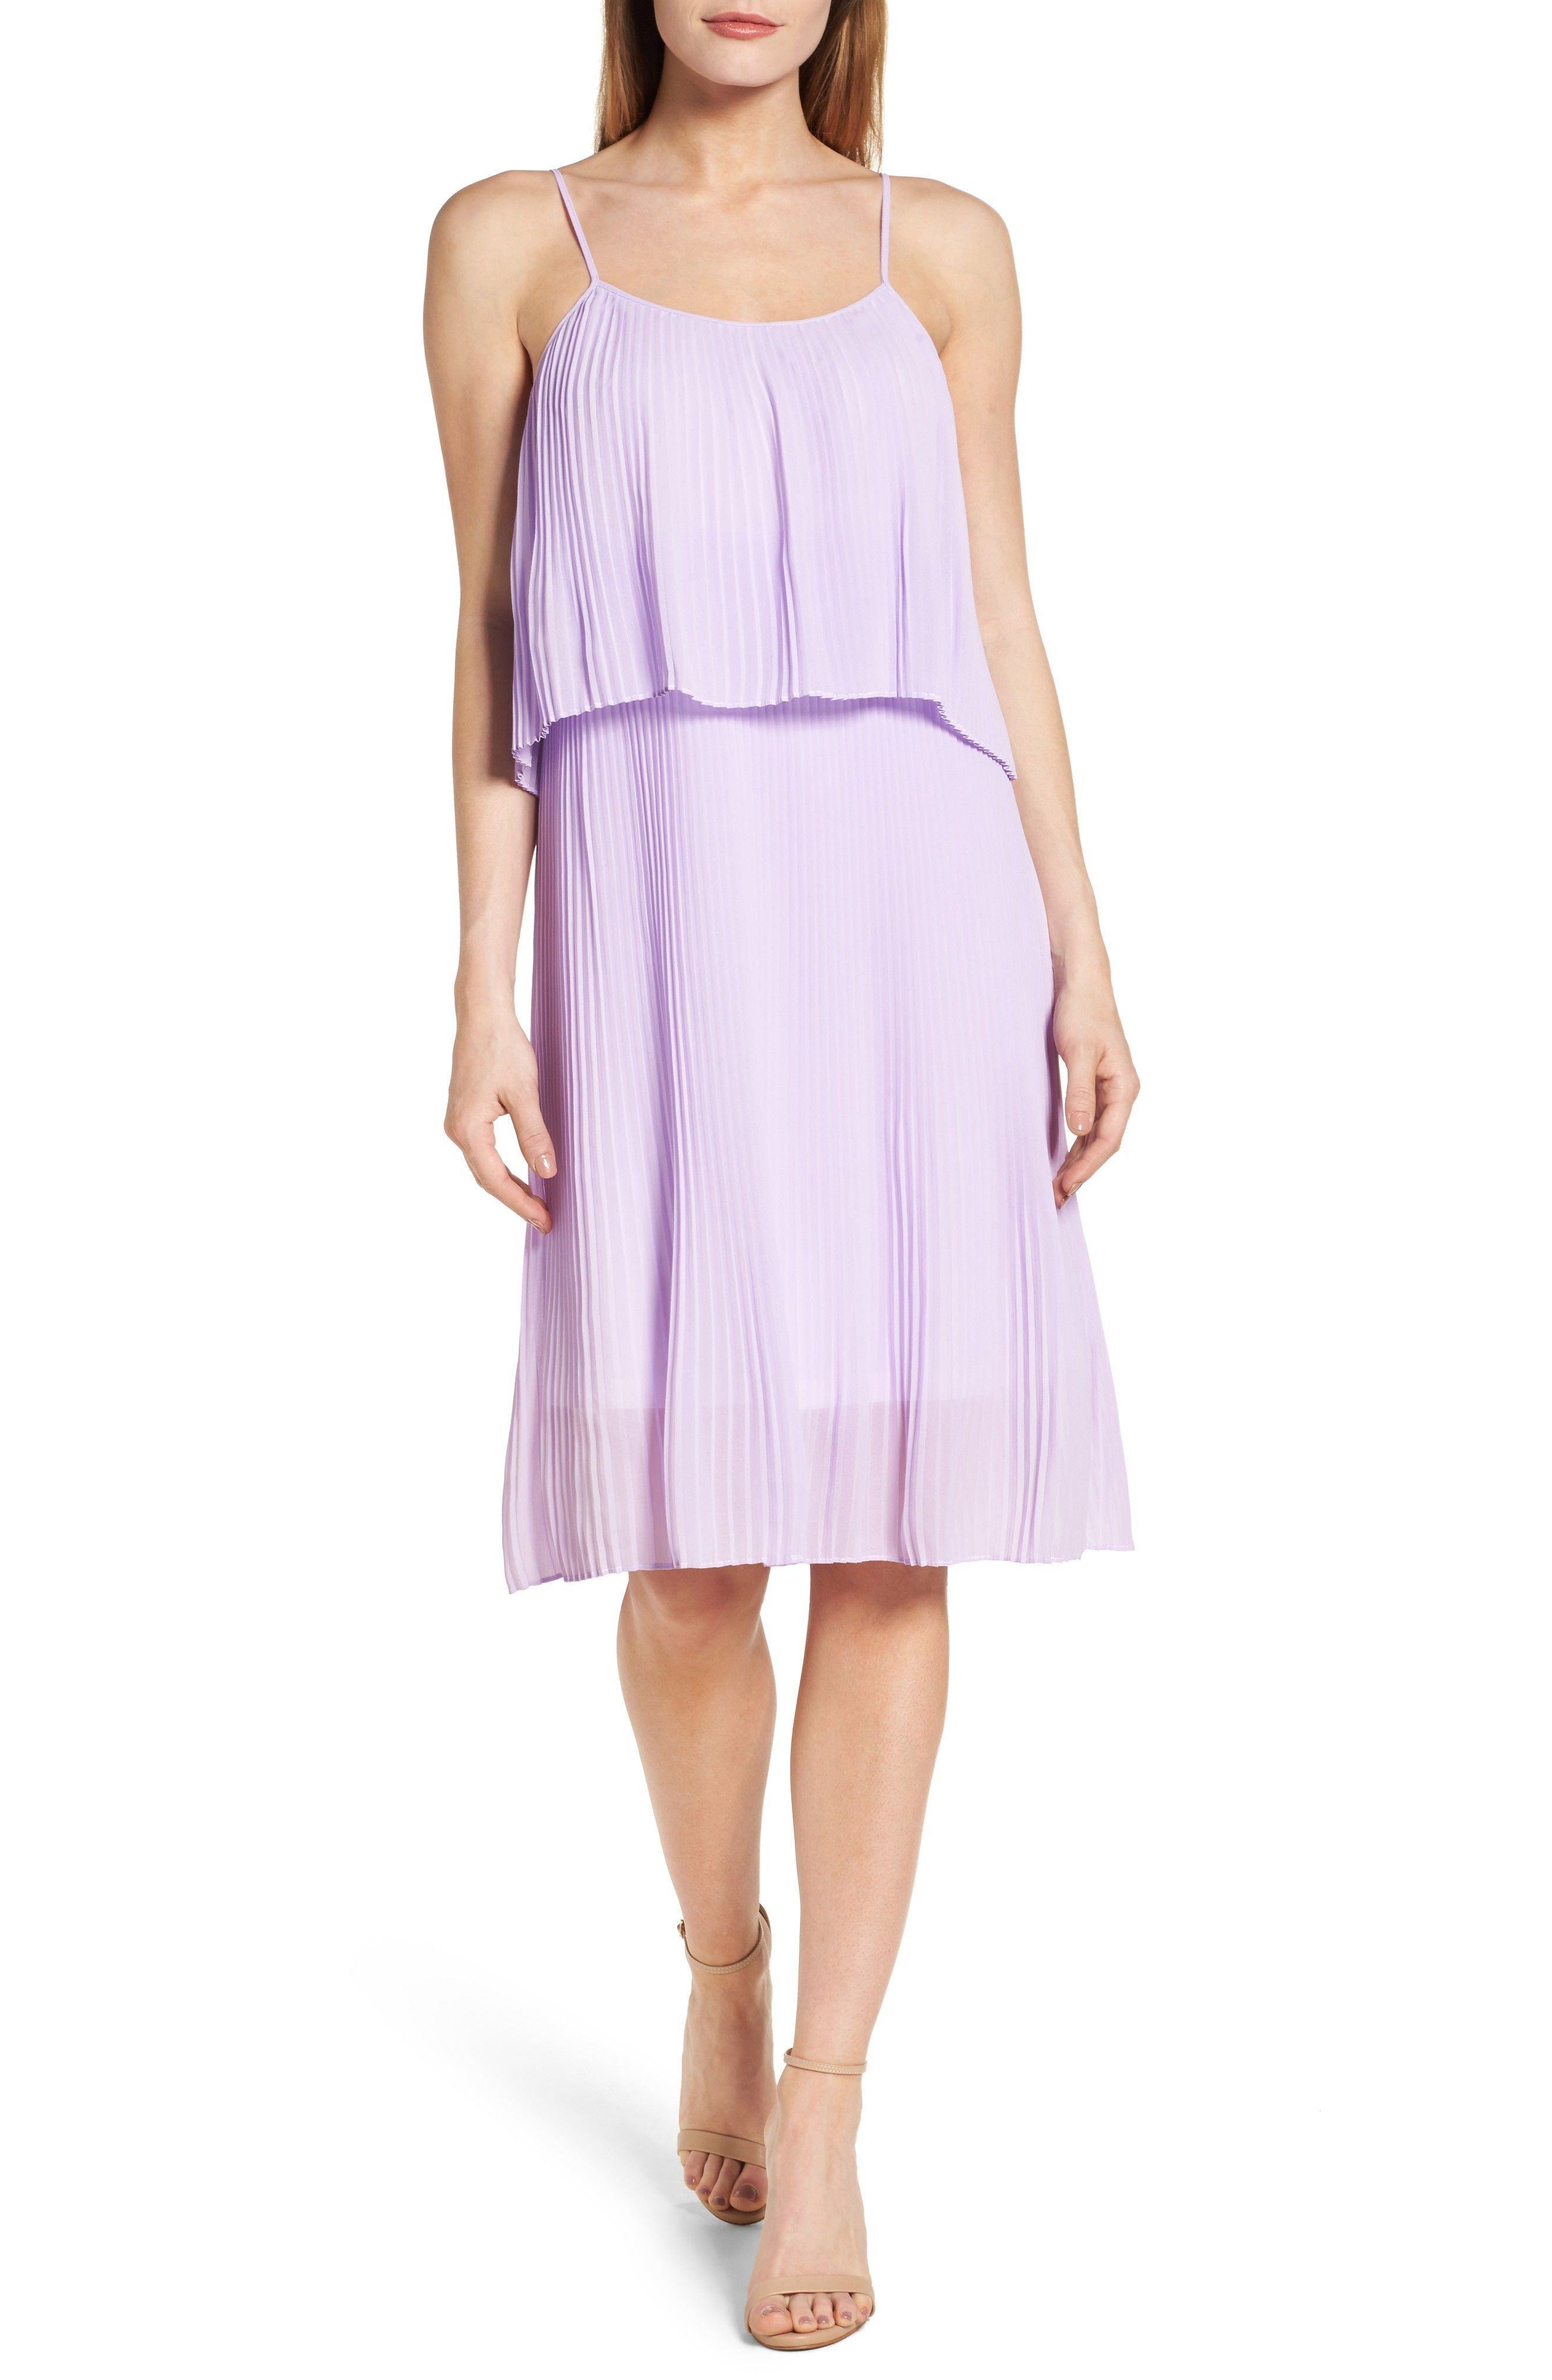 Purple Cocktail Party Dresses: Sequin, Lace, Mesh More | Nordstrom ...